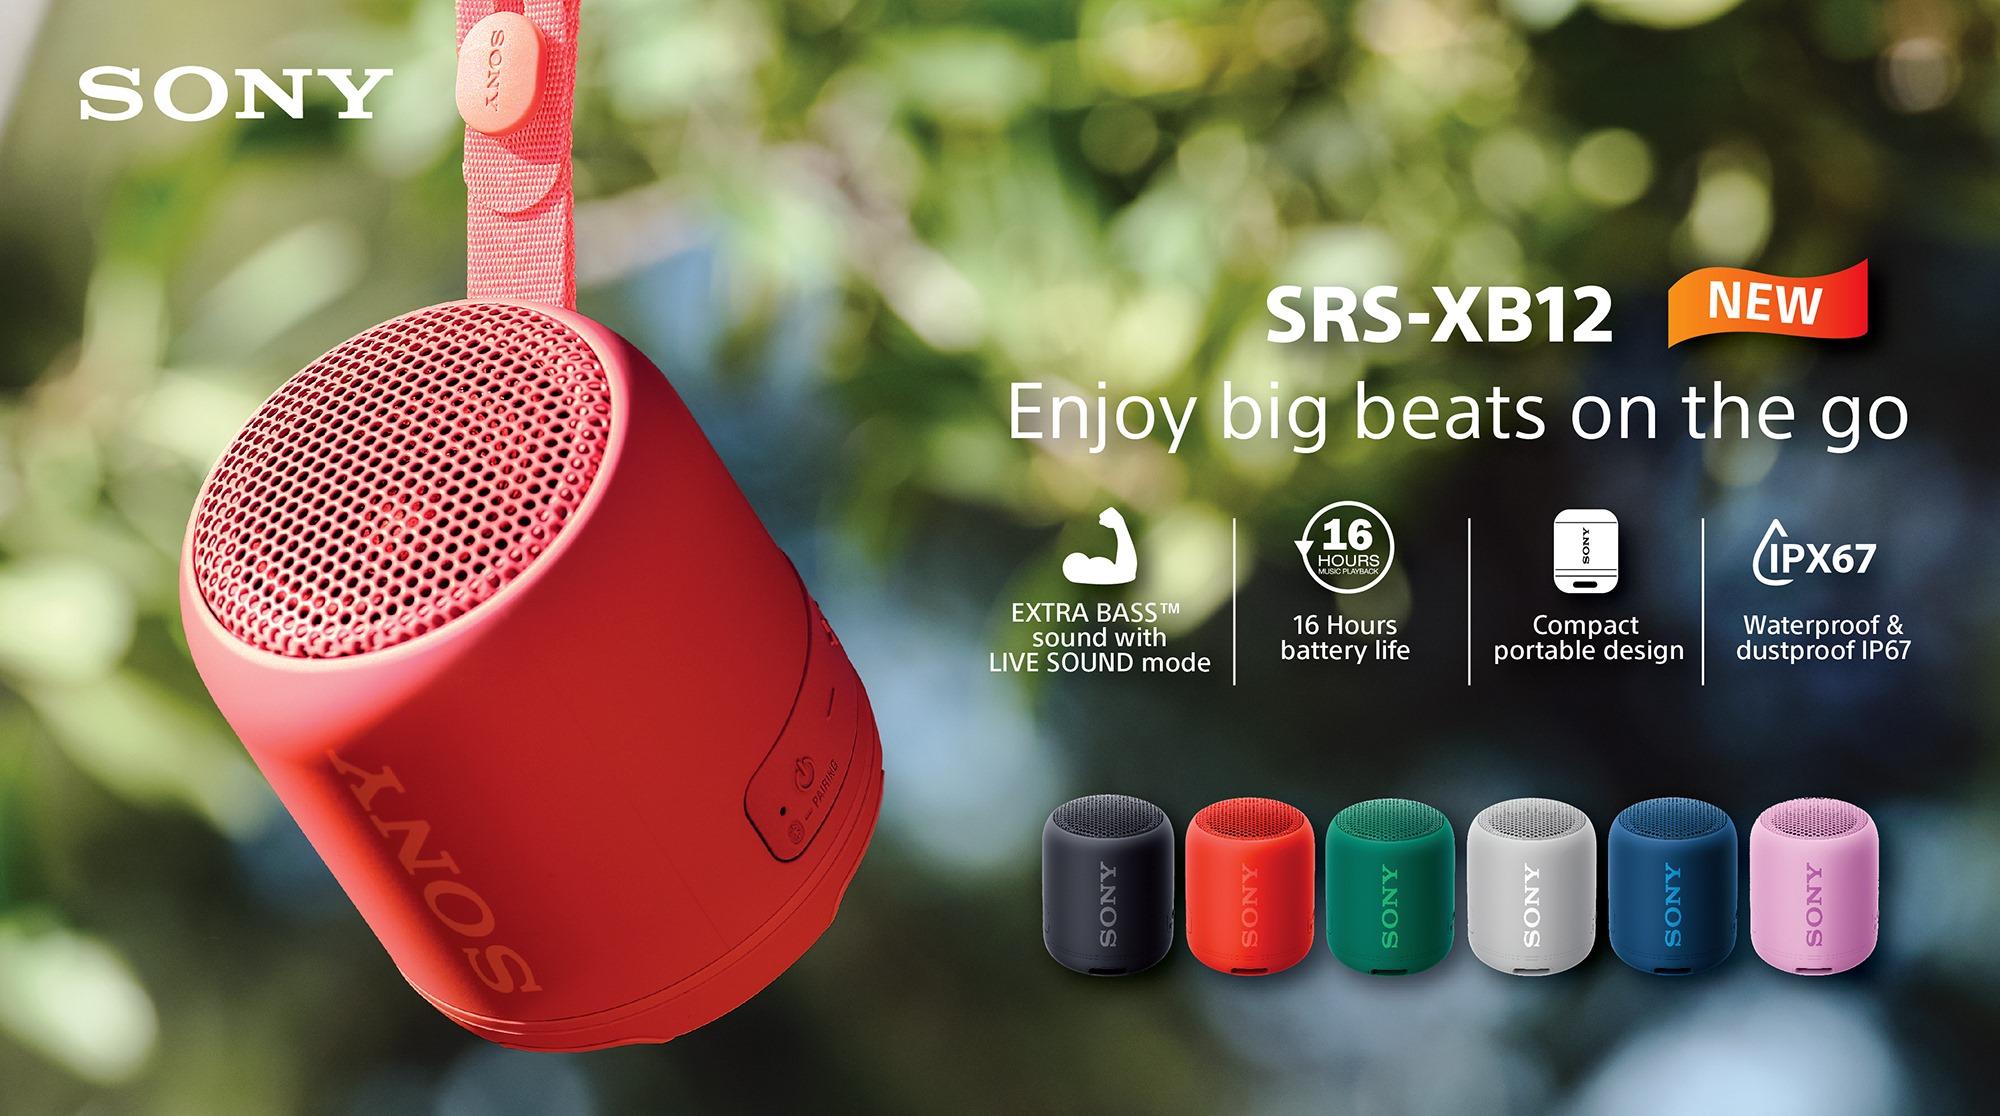 Loa-sony-srs-xb12-tnt-audio